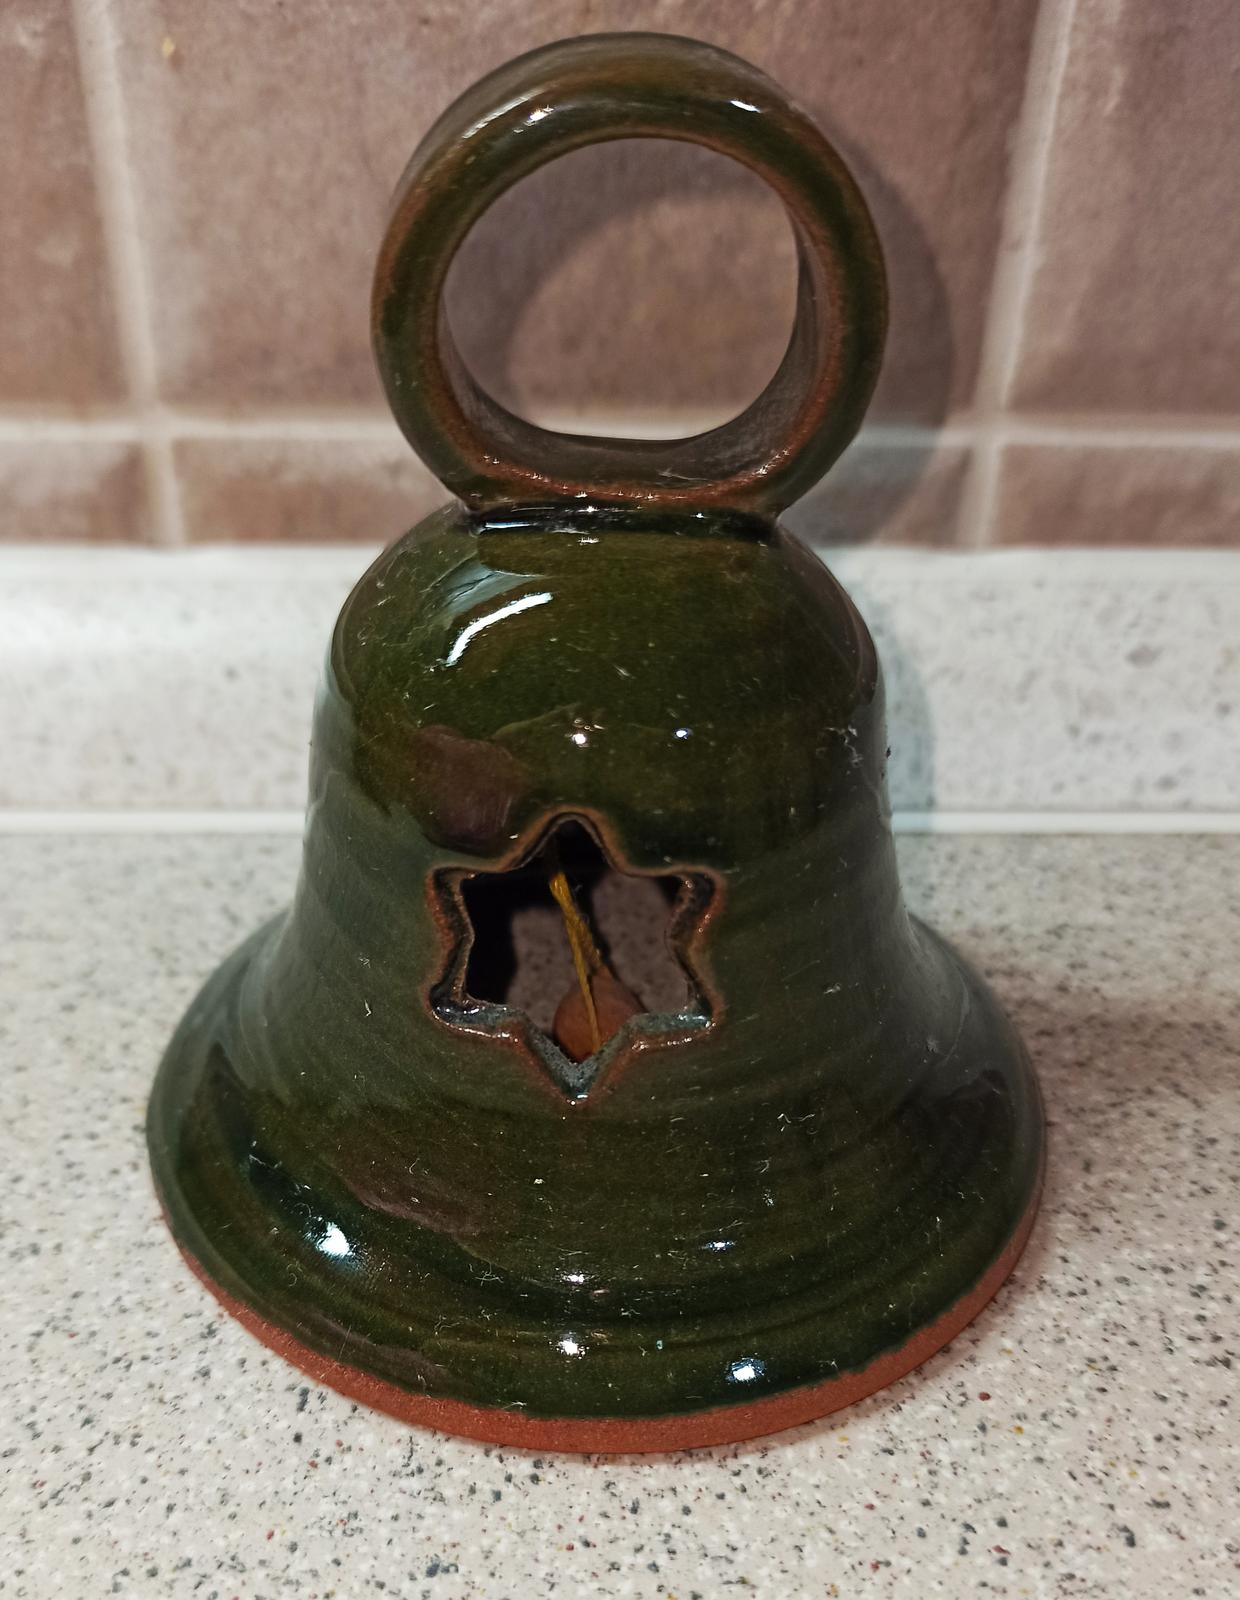 zvonček - Obrázok č. 1